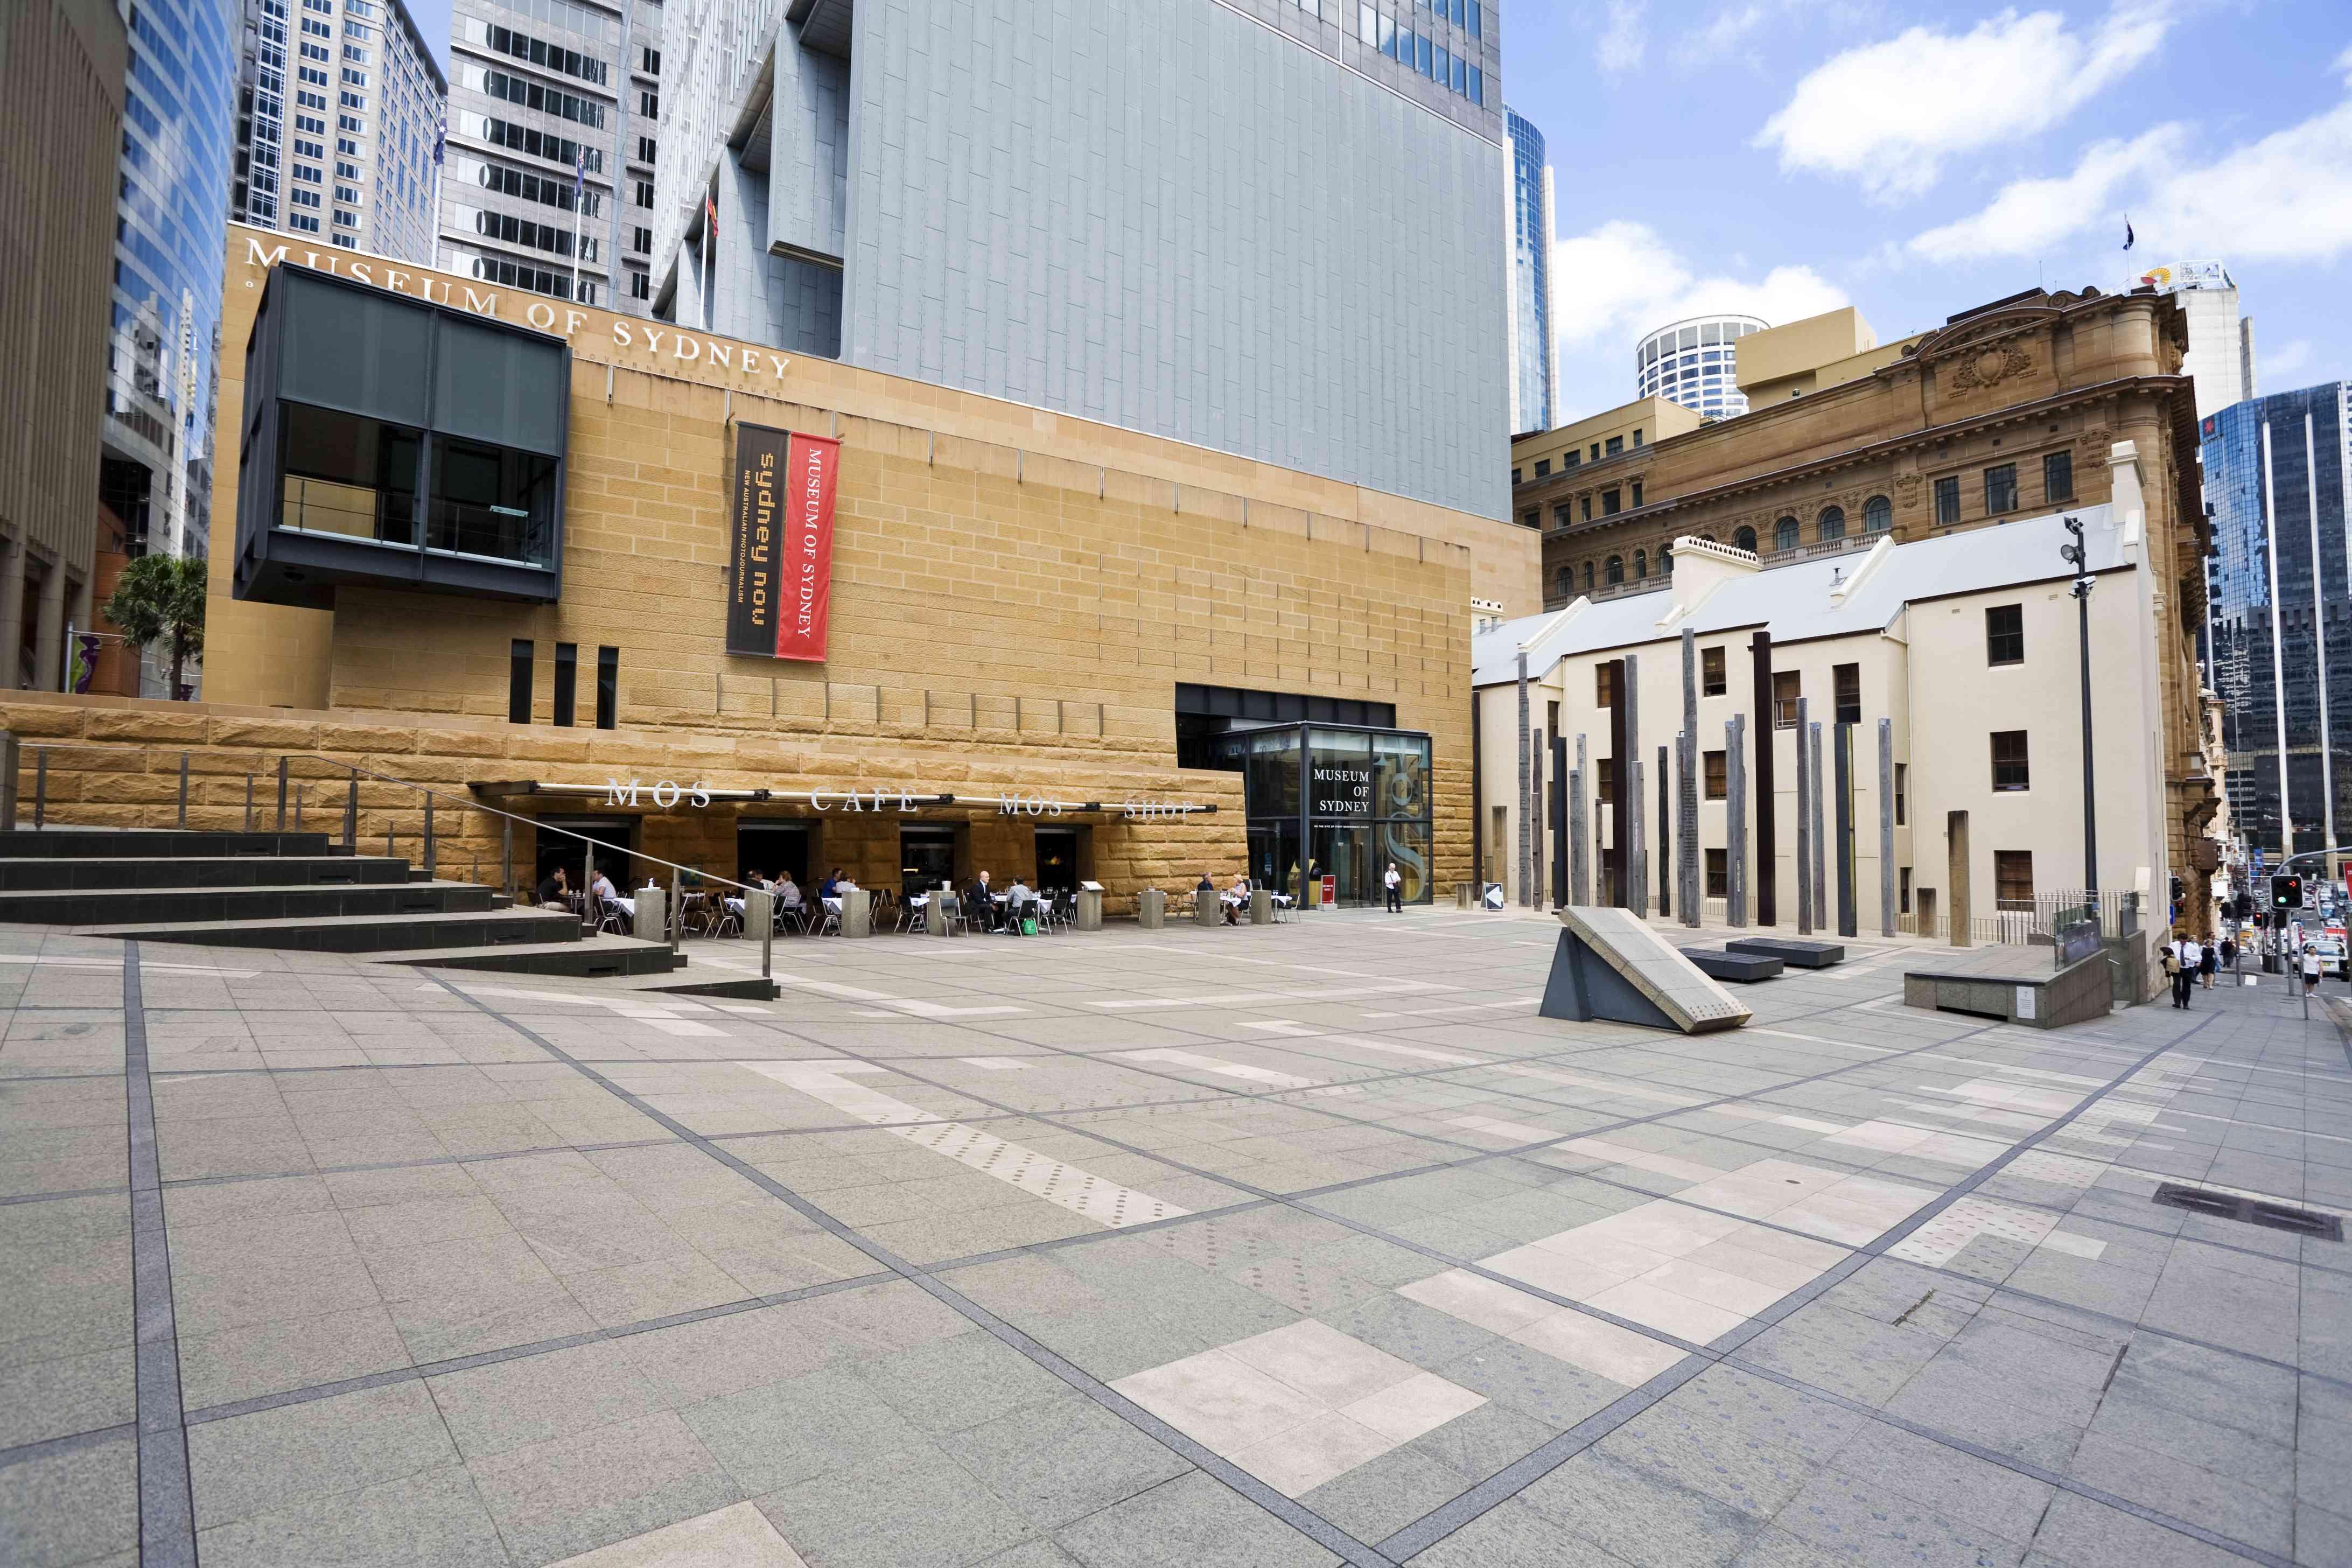 Museum of Sydney, exterior